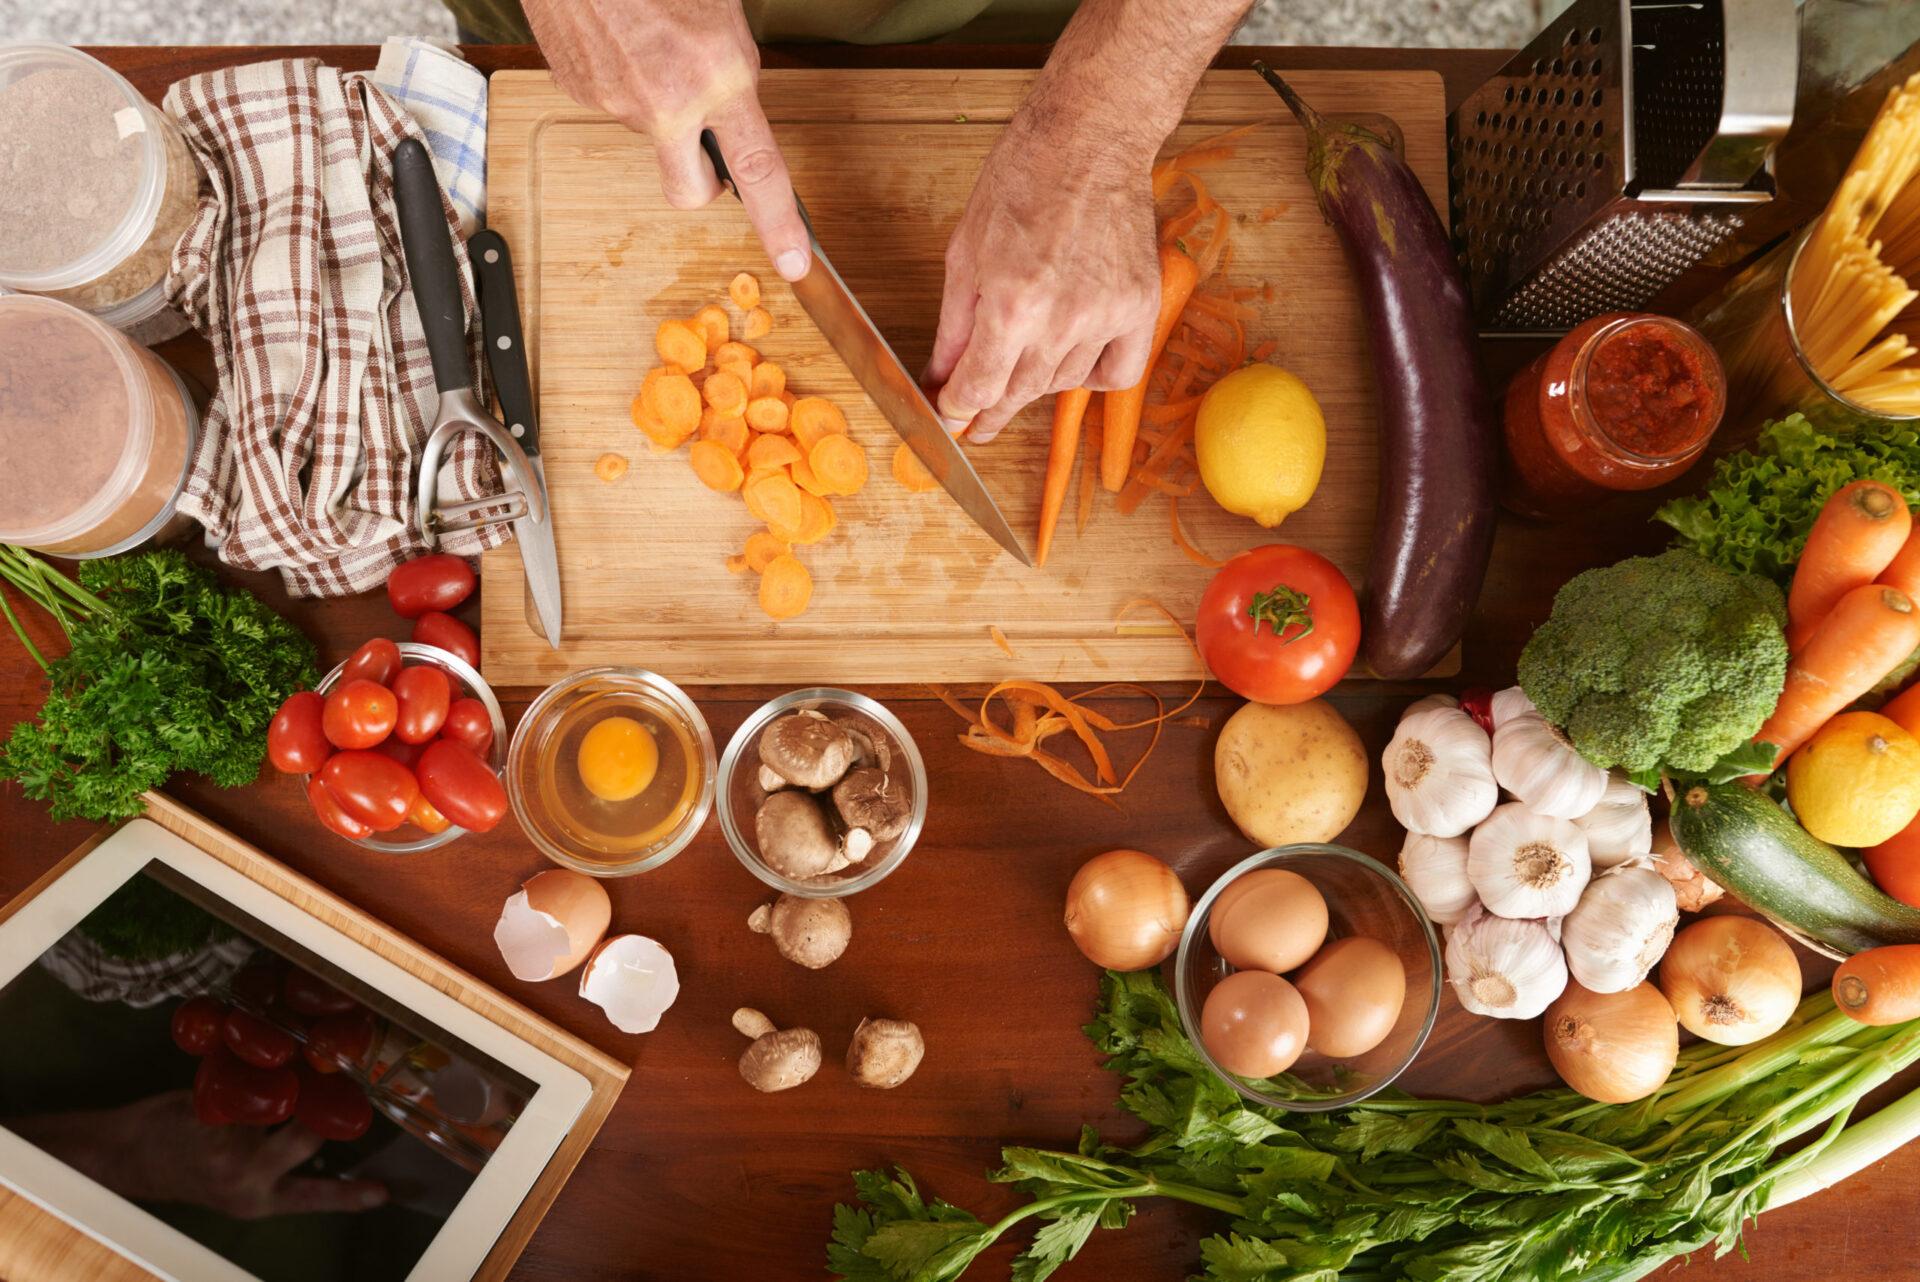 Manos cortando verdura